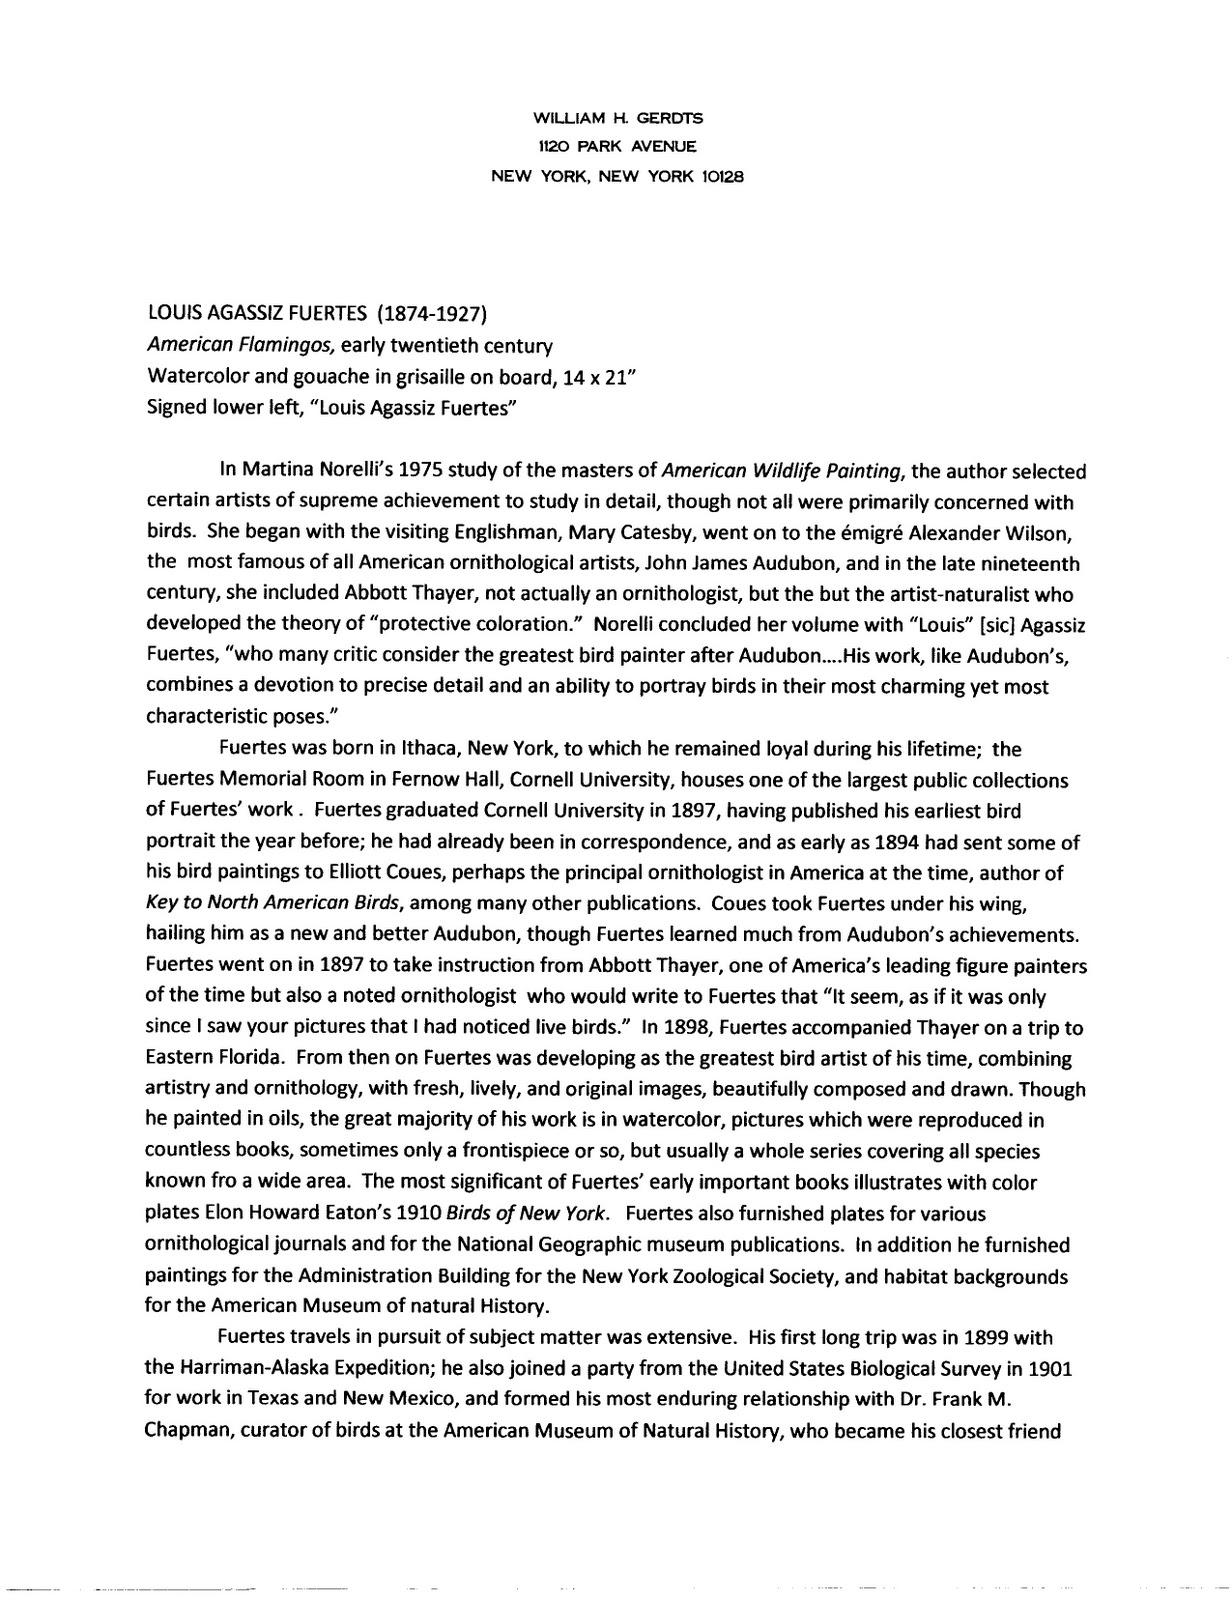 001 Essay Example Fuertes20american20flamingos20001 Graduate Fantastic School Examples Education Header Grad Sample Psychology Full